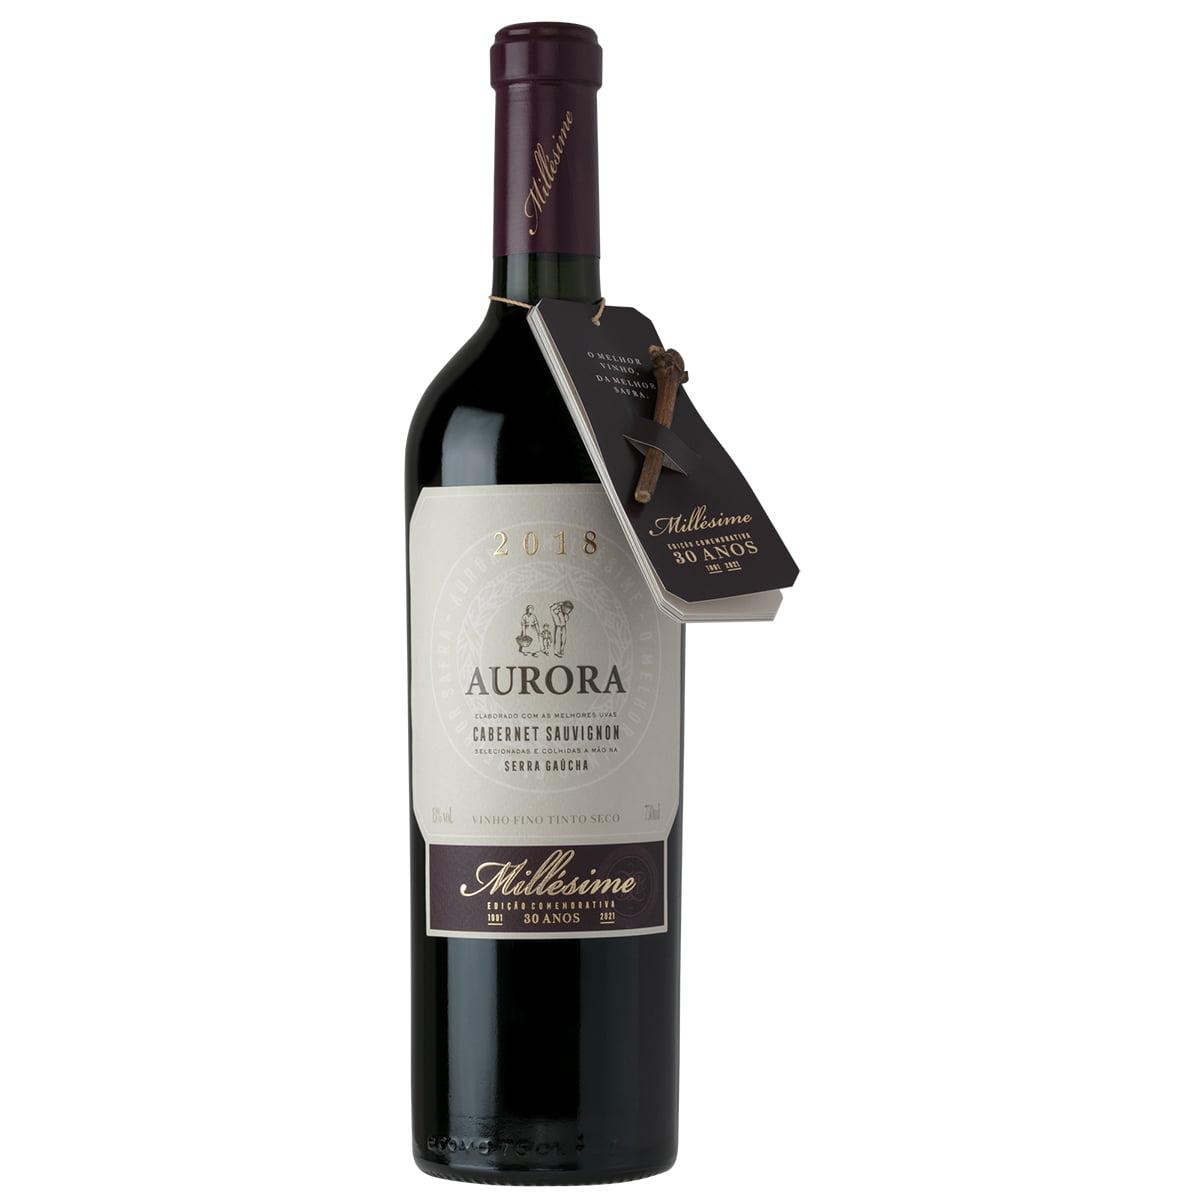 Vinho Aurora Millésime Safra 2018 Cabernet Sauvignon Tinto Seco 750ml